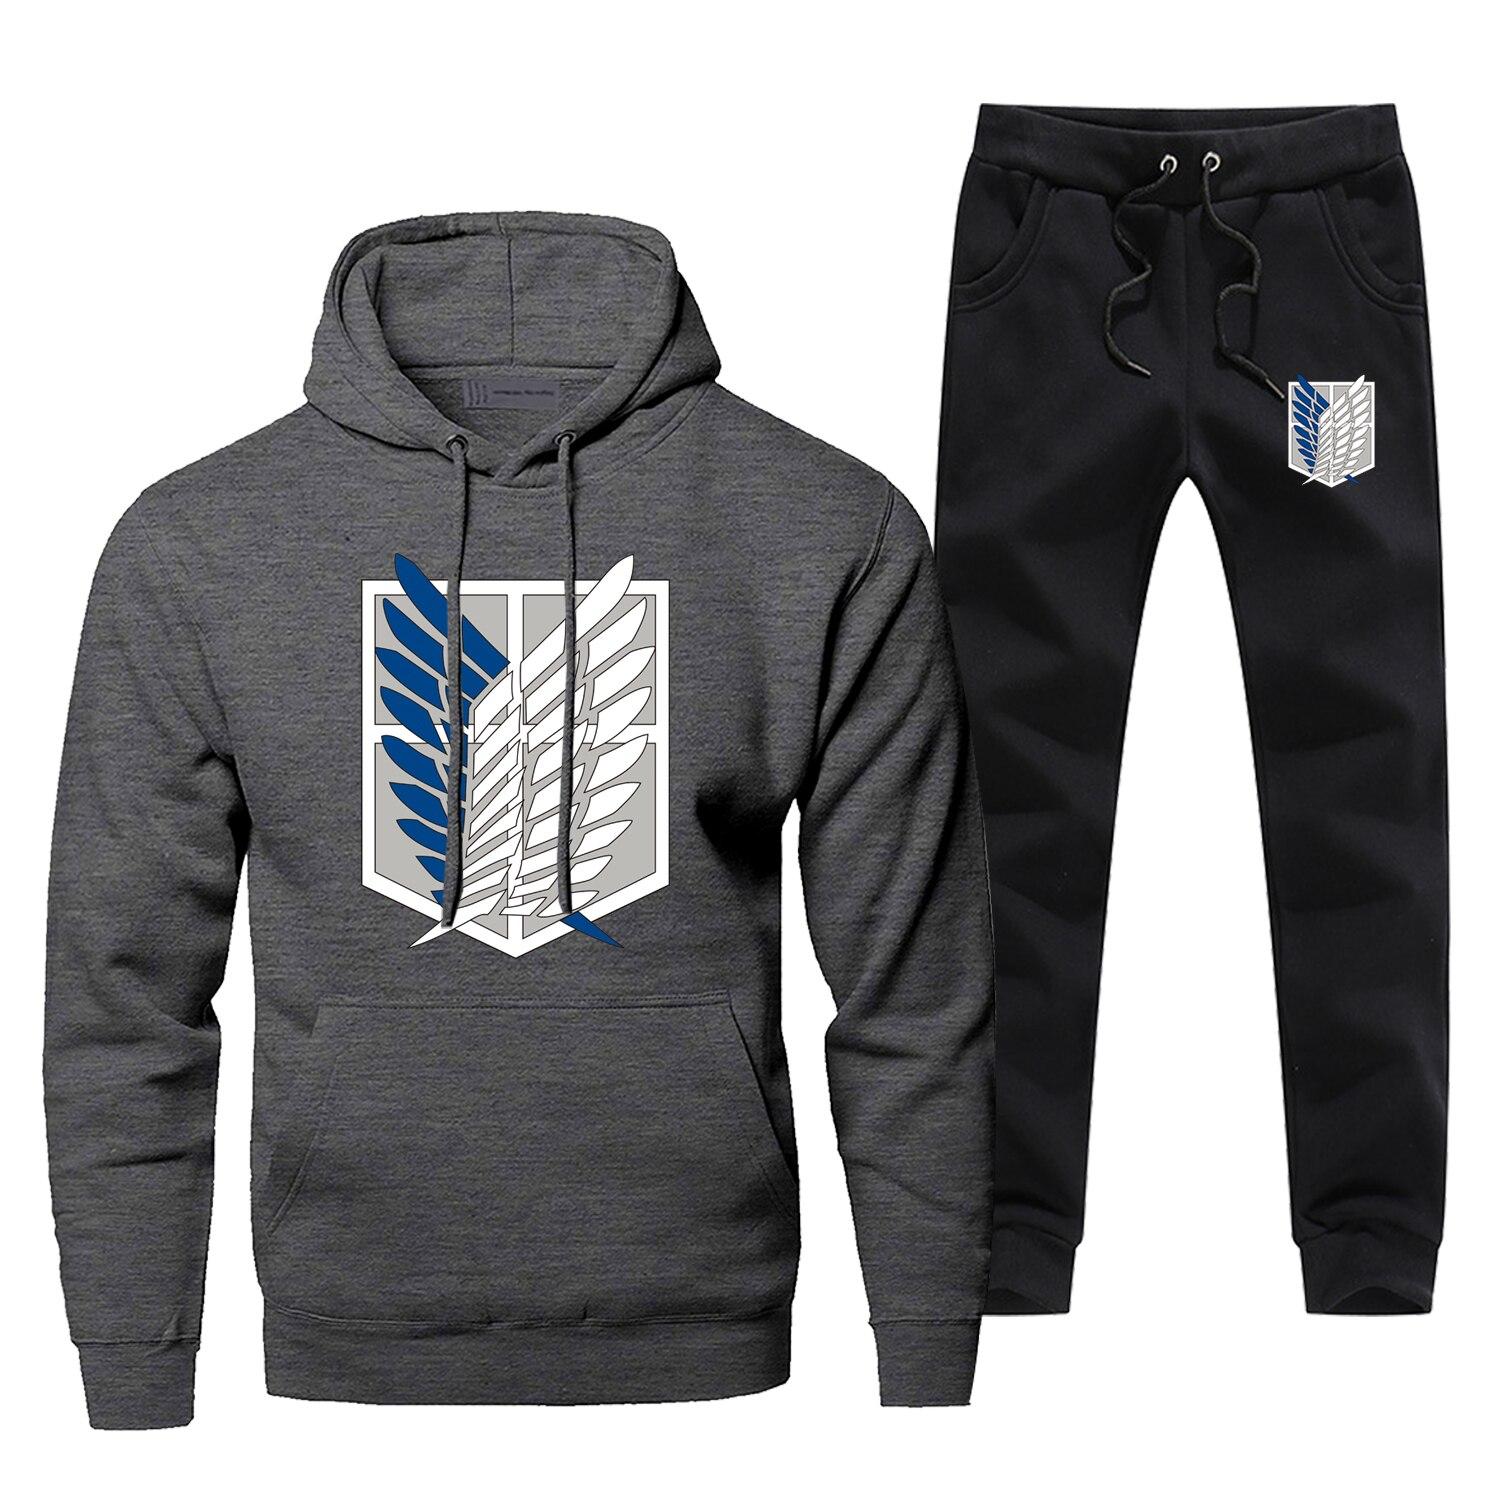 Attack On Titan Japanese Anime Hoodie Pants Sets Men Fashion Sweatshirt Winter Fleece Sportswear Sweatpants Harajuku Streetwear